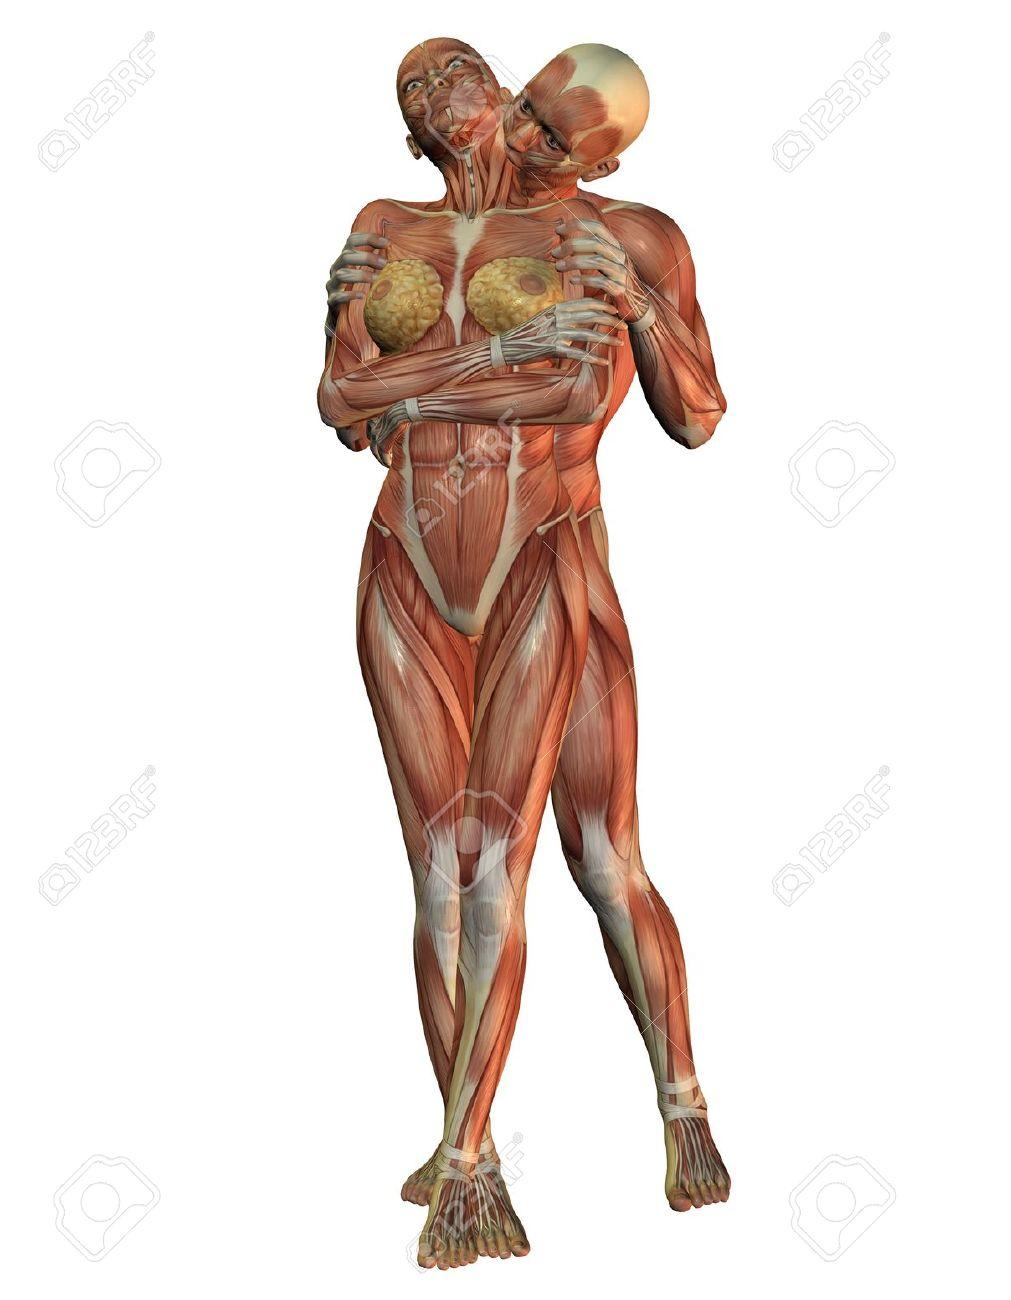 Charmant Interaktiver Anatomieatlas Galerie - Anatomie Ideen ...